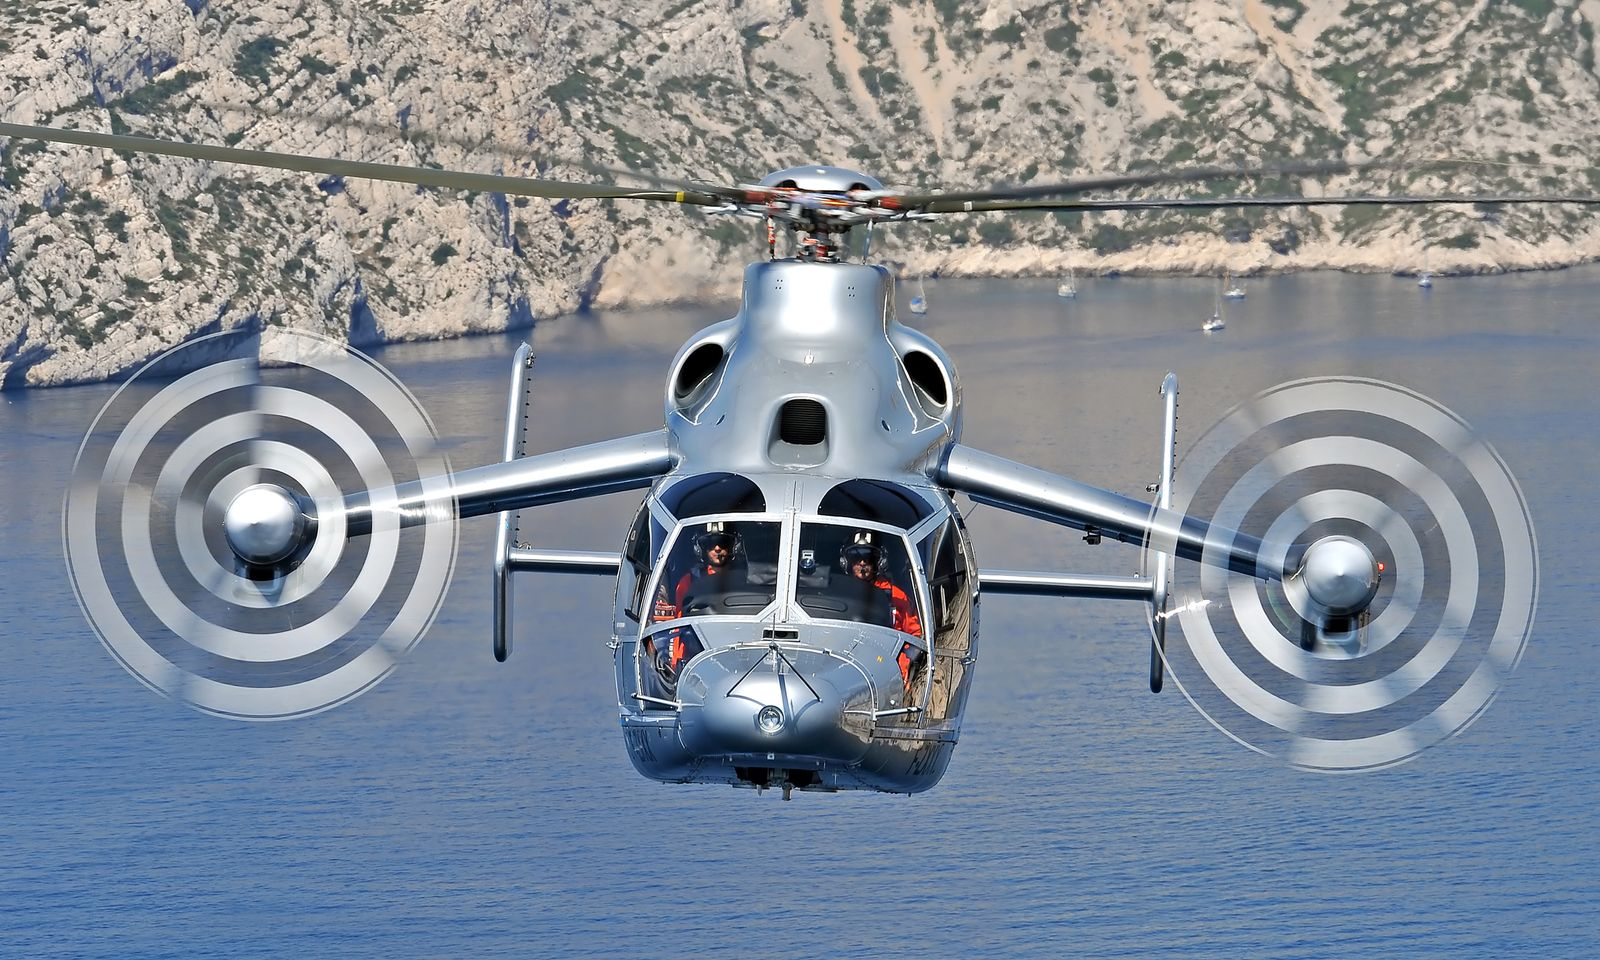 Eurocopter X3 / Luftverkehr / EADS